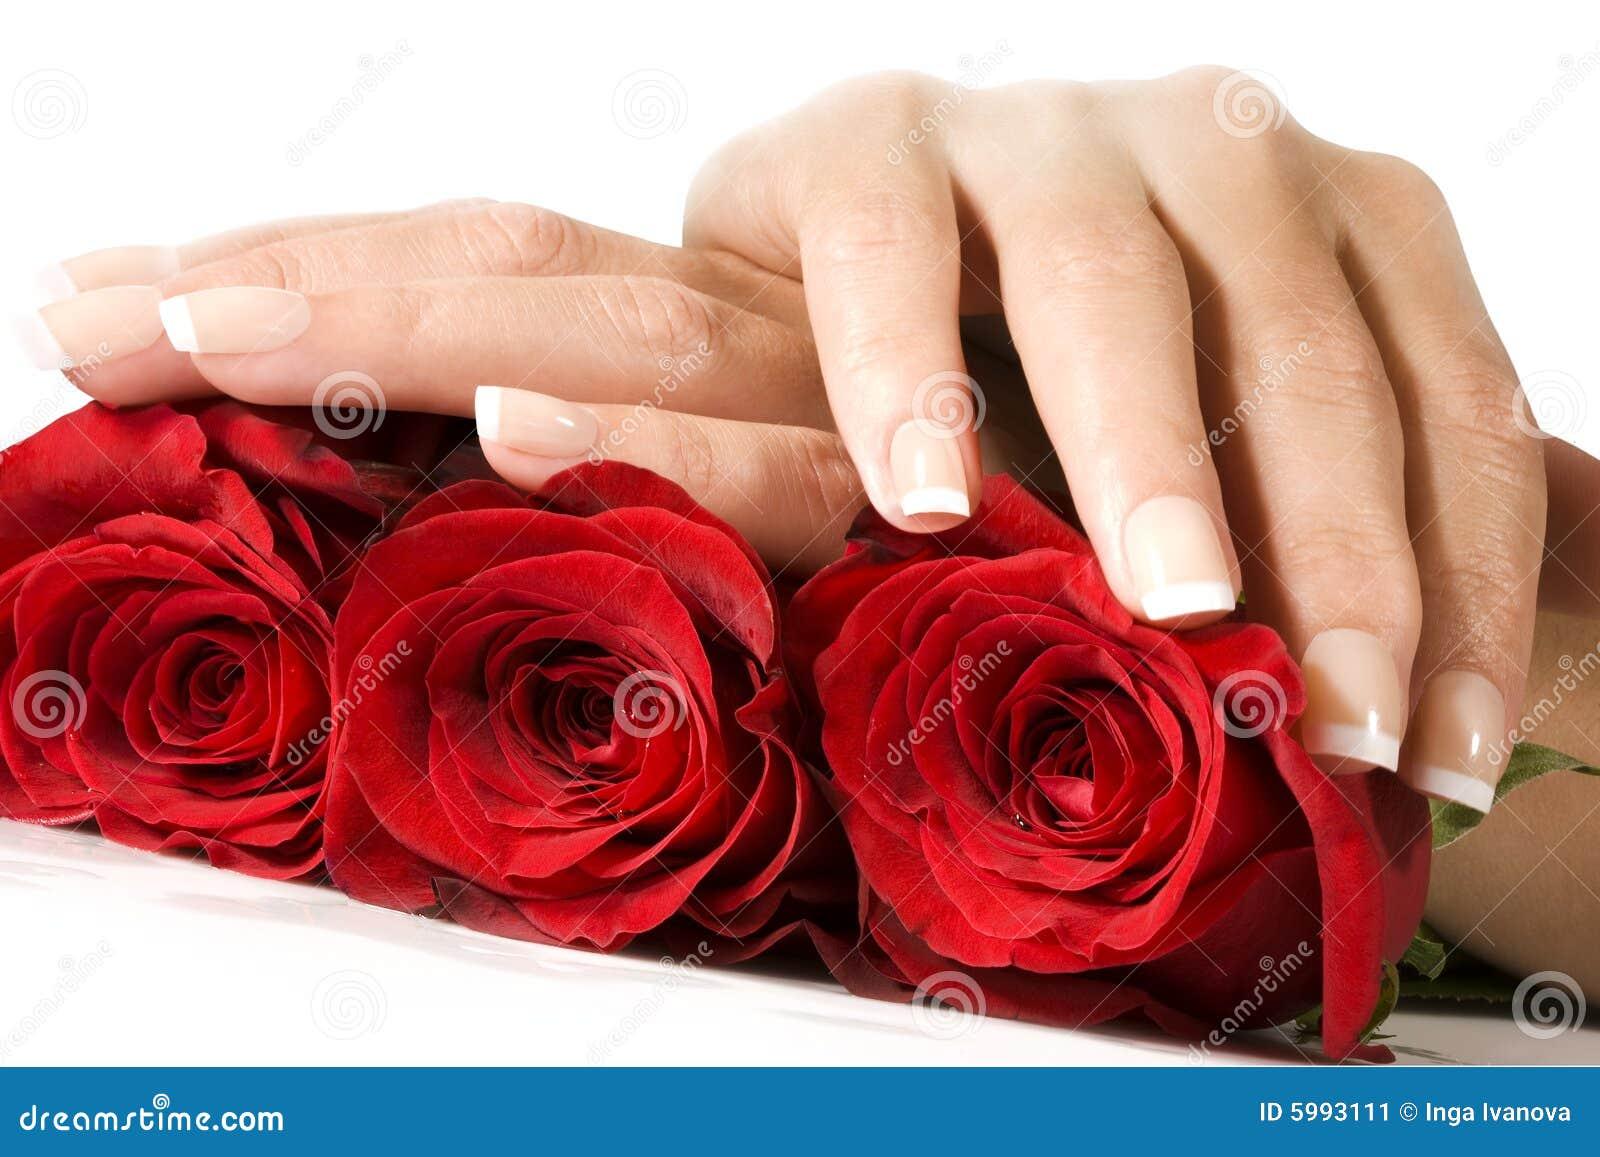 mujer y rosa roja - photo #23